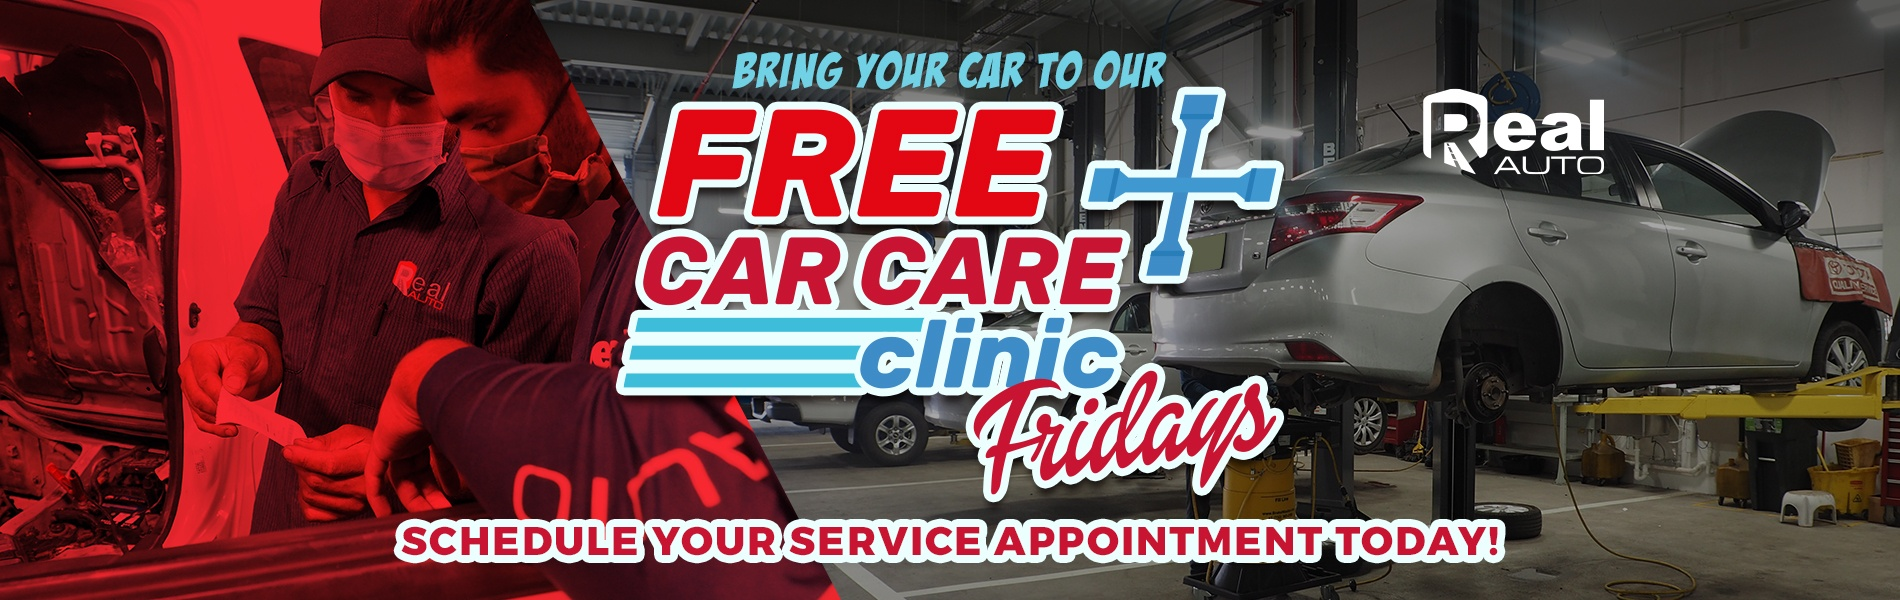 Free Car Care Clinic Fridays